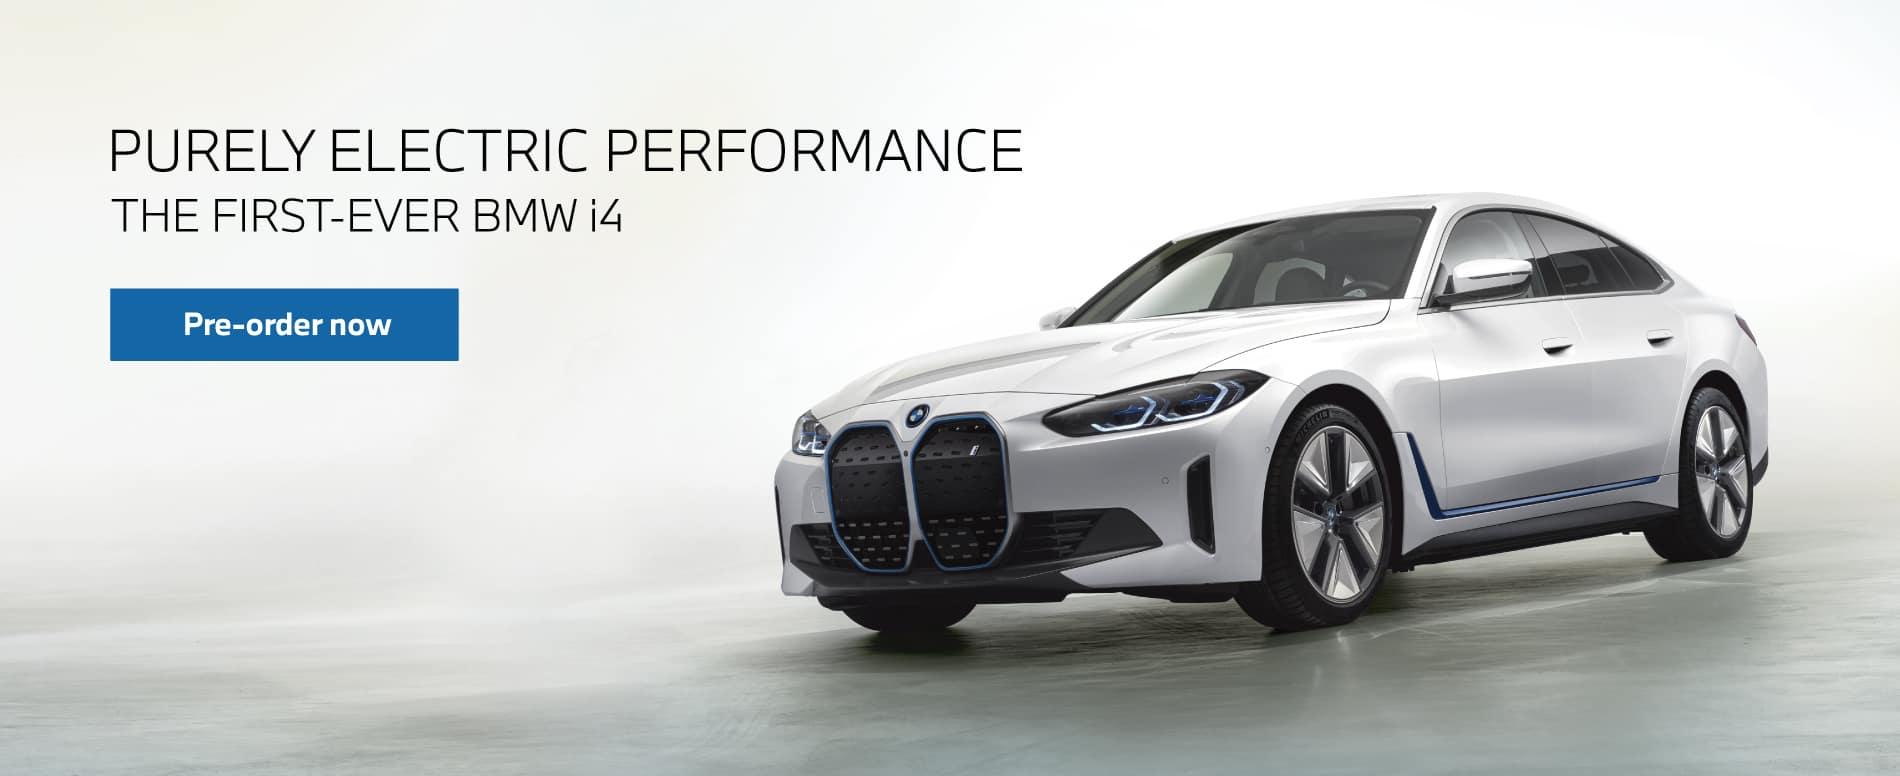 17605-BenBmw-May21-BMW-i4-Pre-order-1900×776